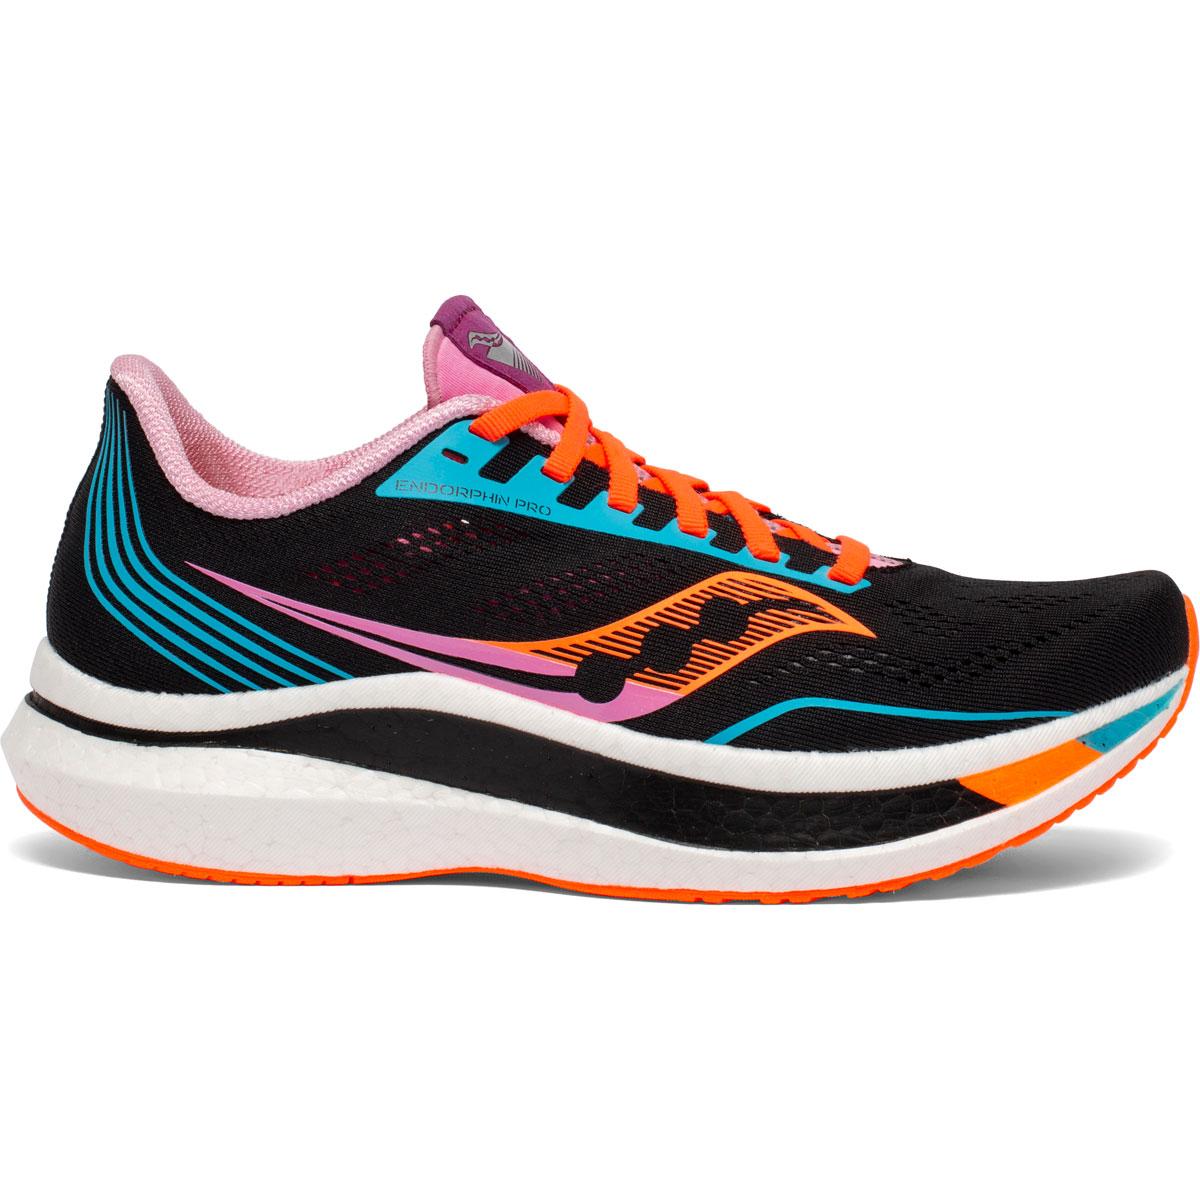 Women's Saucony Endorphin Pro Running Shoe - Color: Future/Black - Size: 5 - Width: Regular, Future/Black, large, image 1